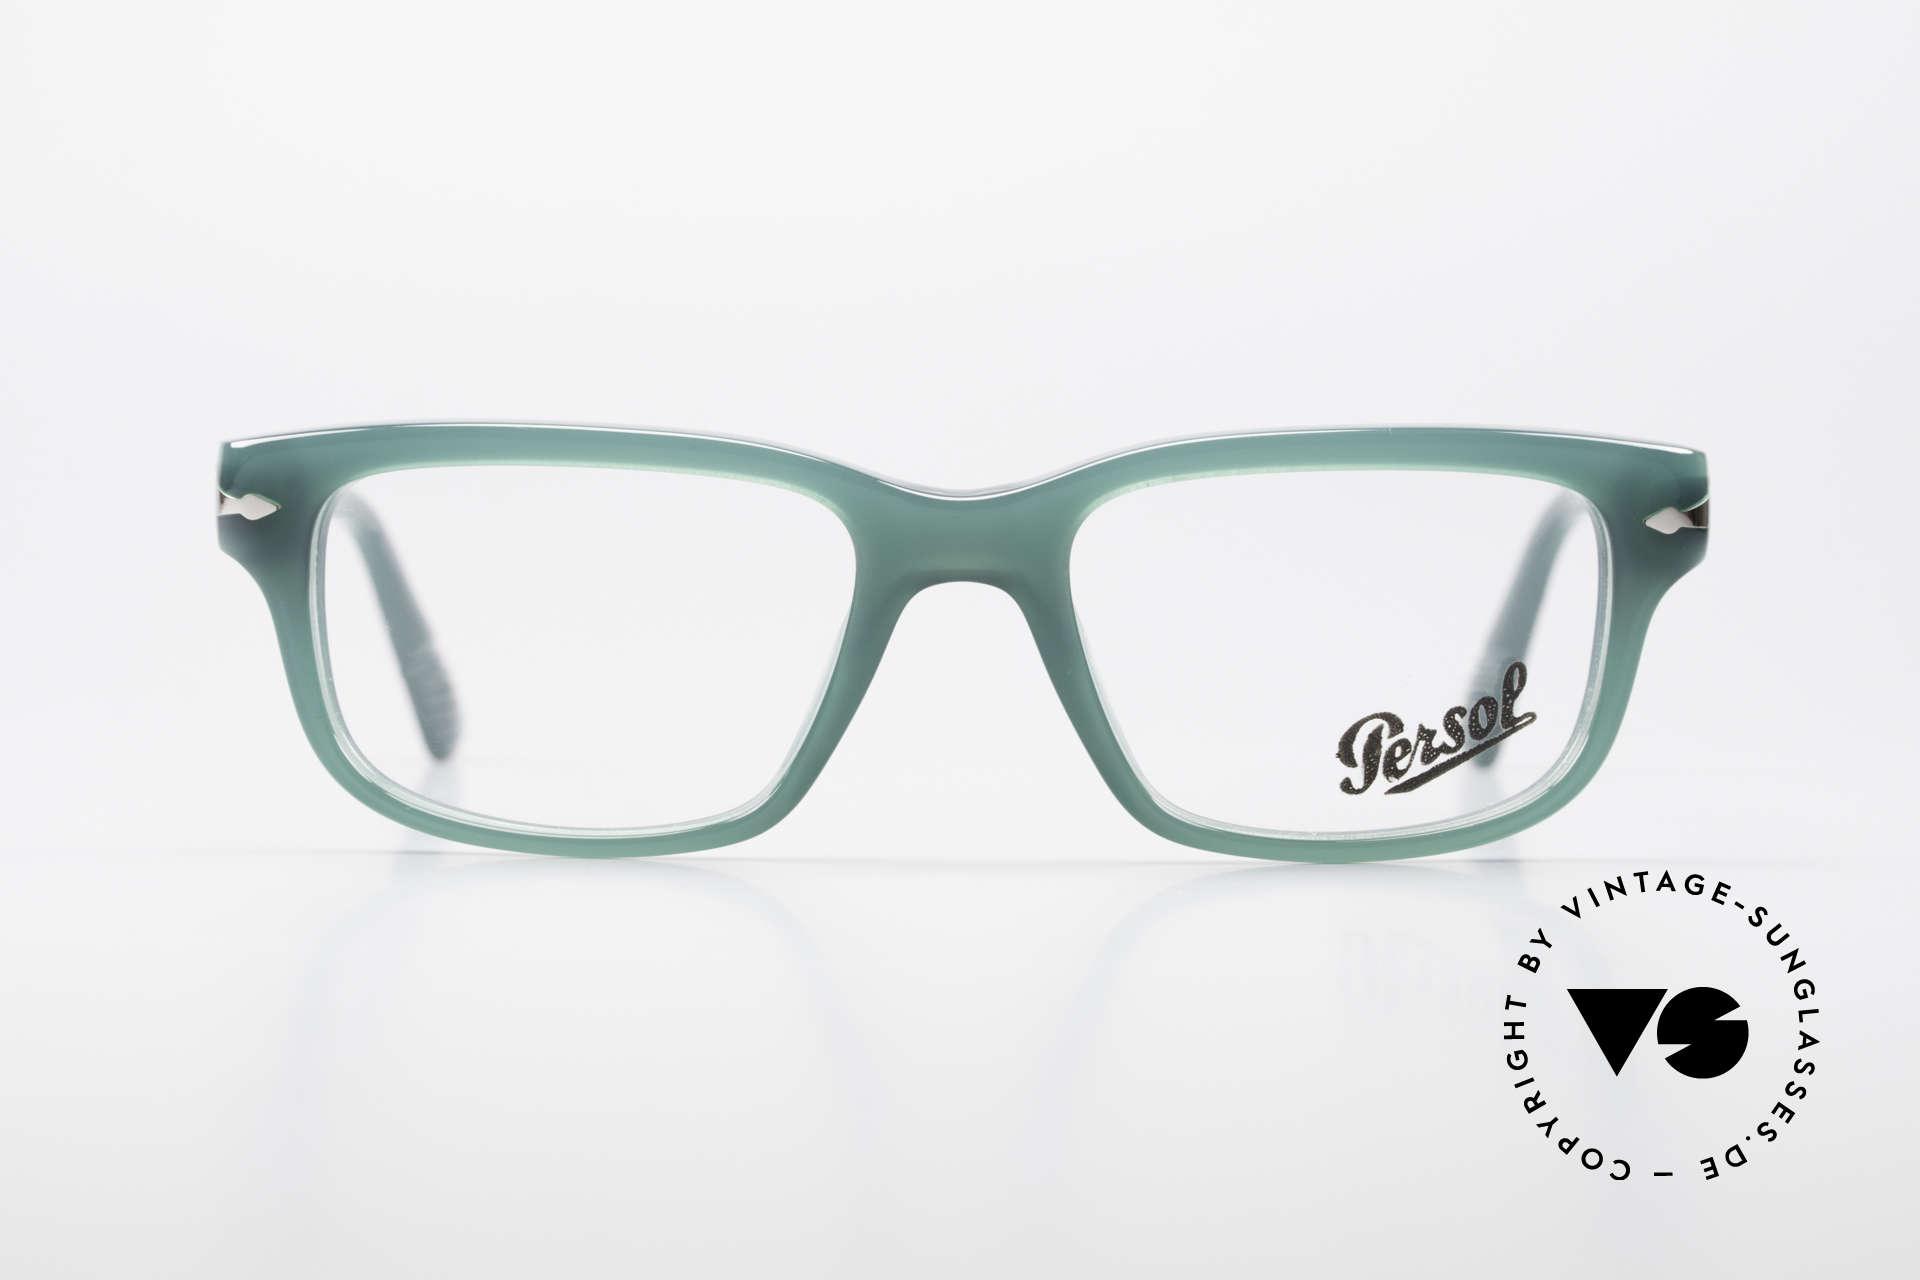 Persol 3073 Film Noir Edition Eyeglasses, Film Noir Edition: Persol arrow = Phoenix arrow, Made for Men